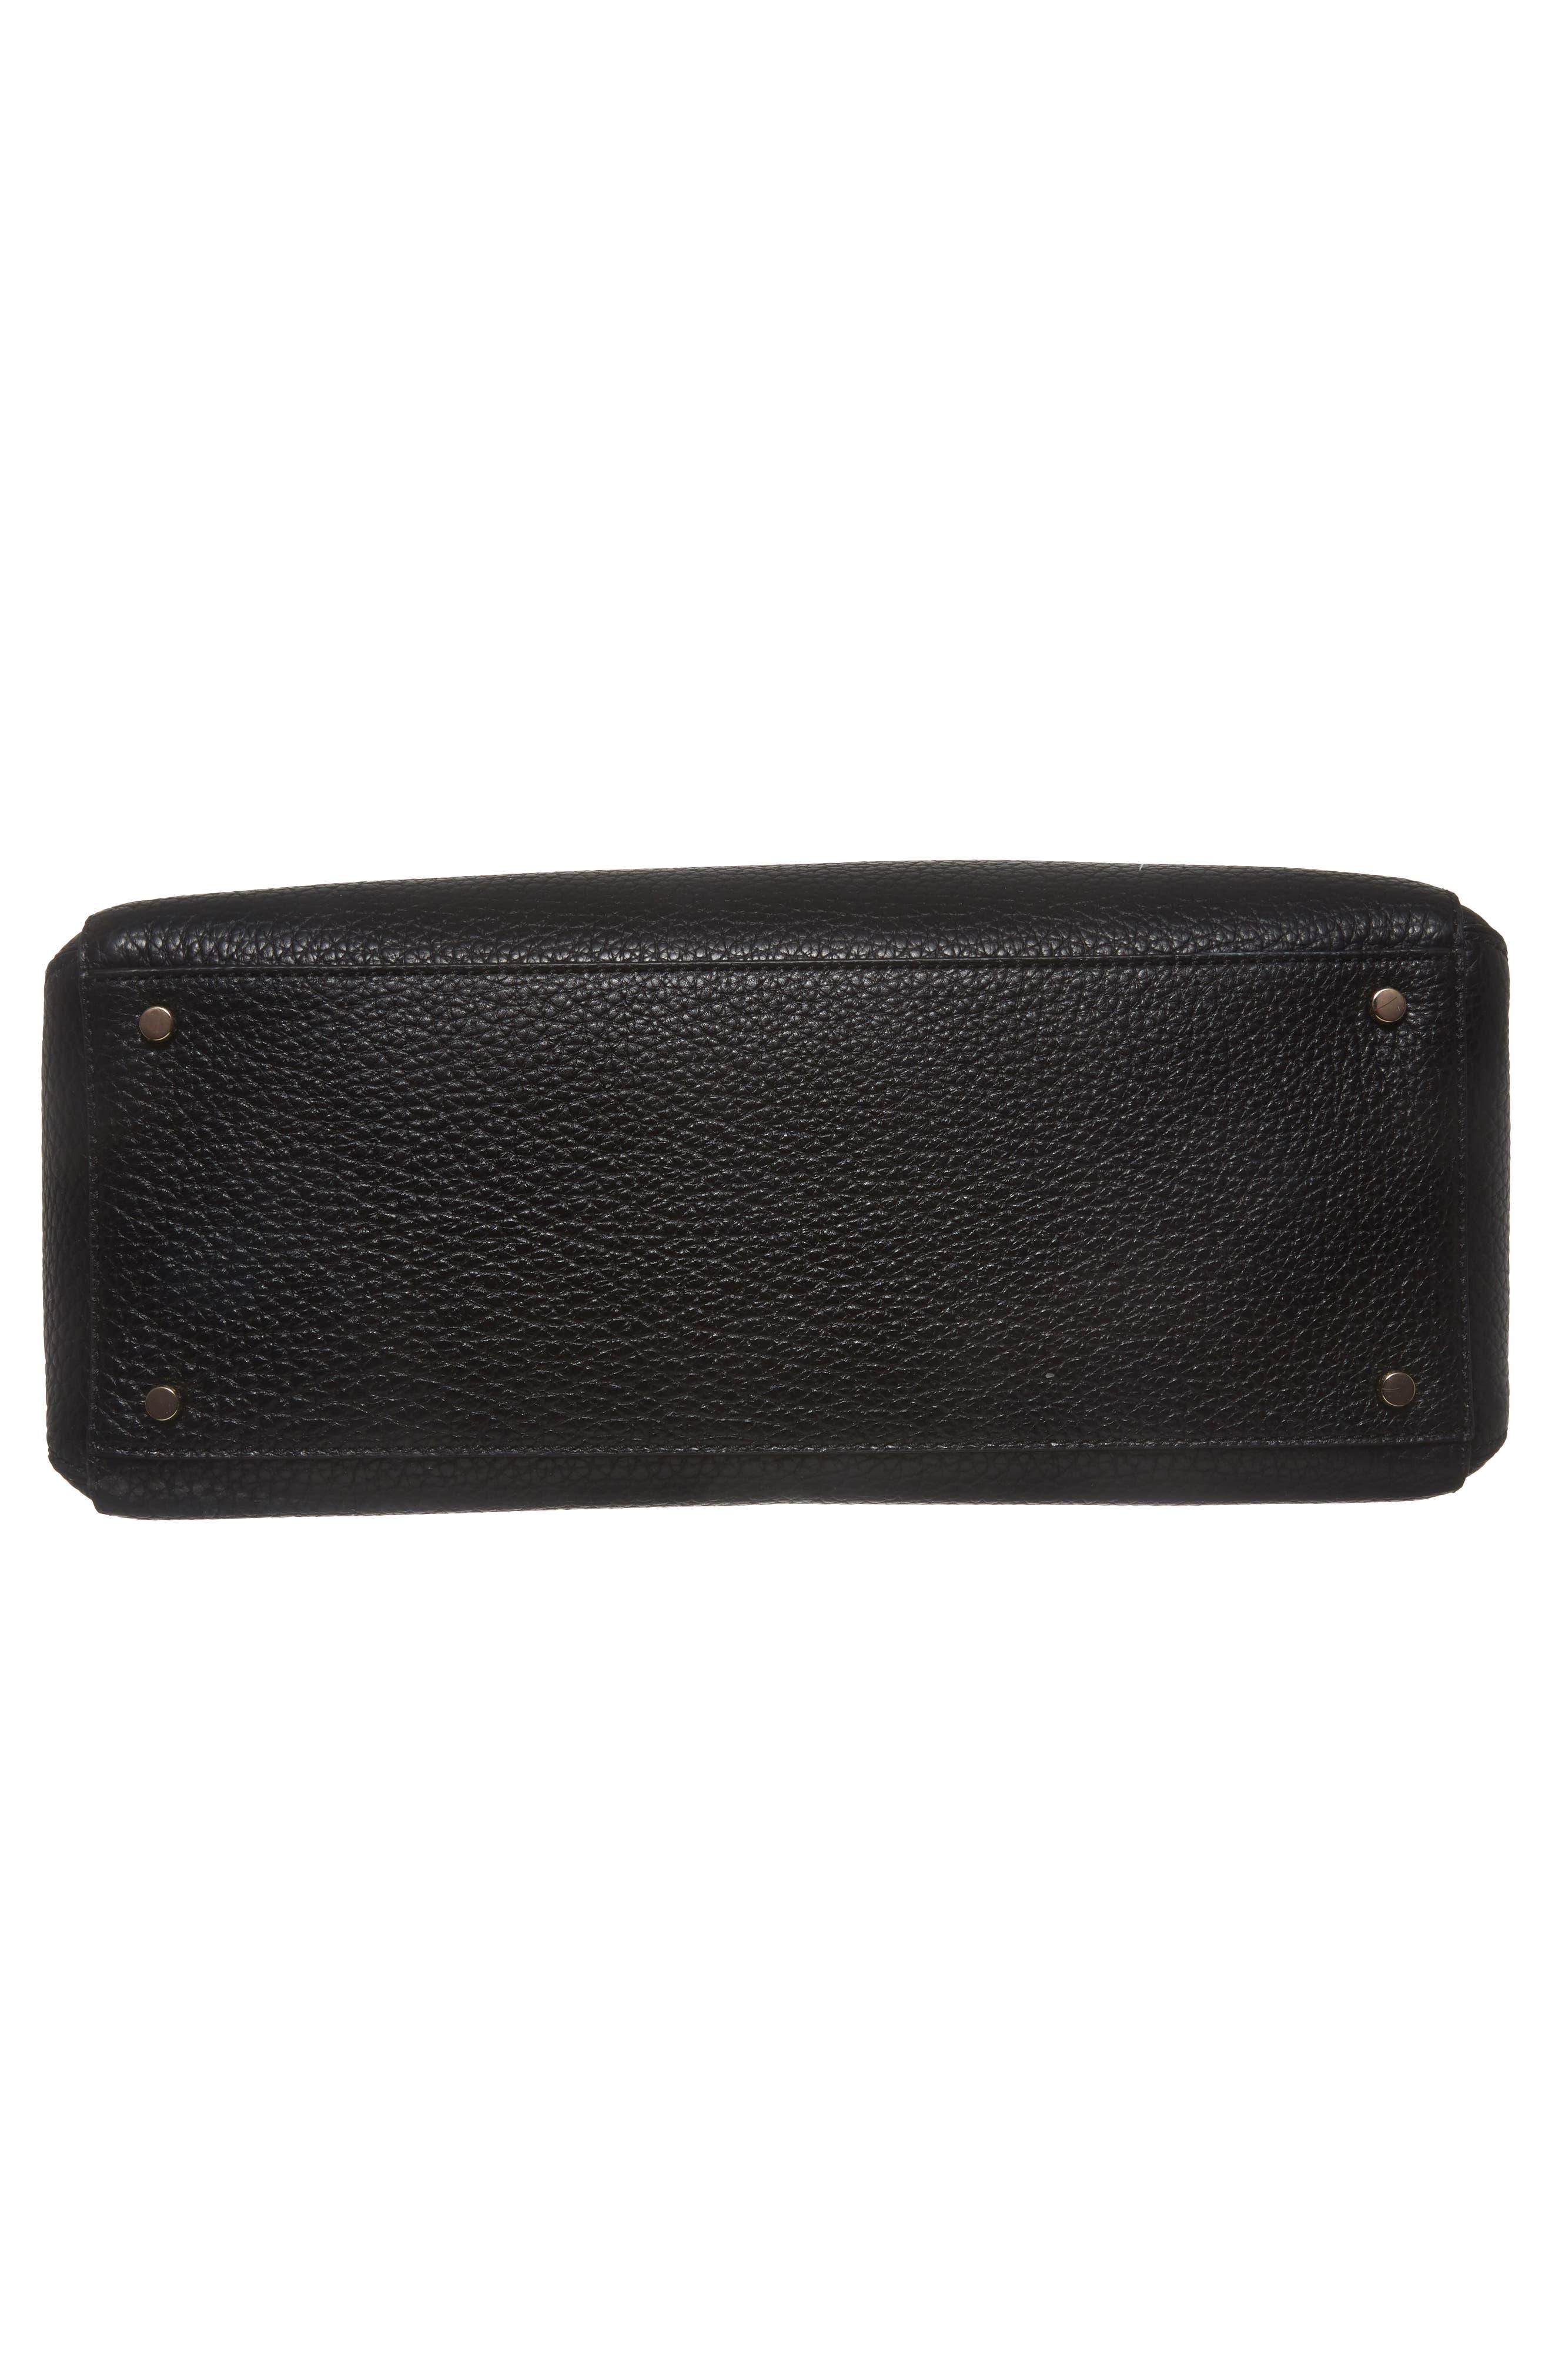 carter street - tyler leather tote,                             Alternate thumbnail 6, color,                             Black